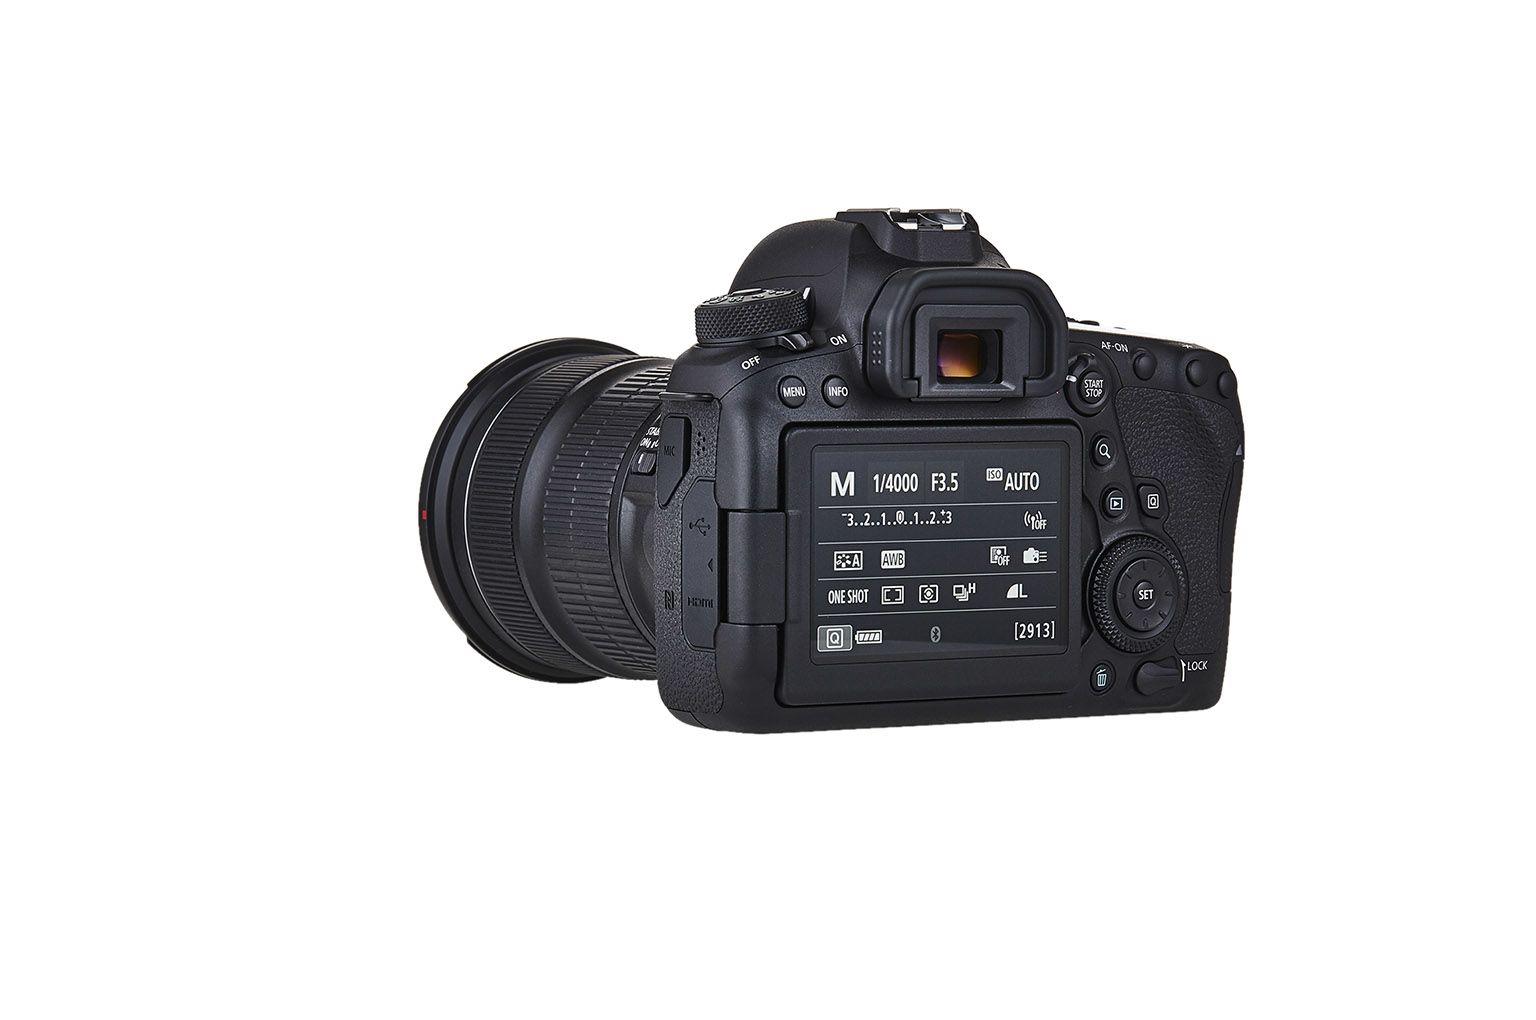 Canon Eos 6d Mark Ii Batteriegriff Bg E21 Ricoh Strap St 3 W 100